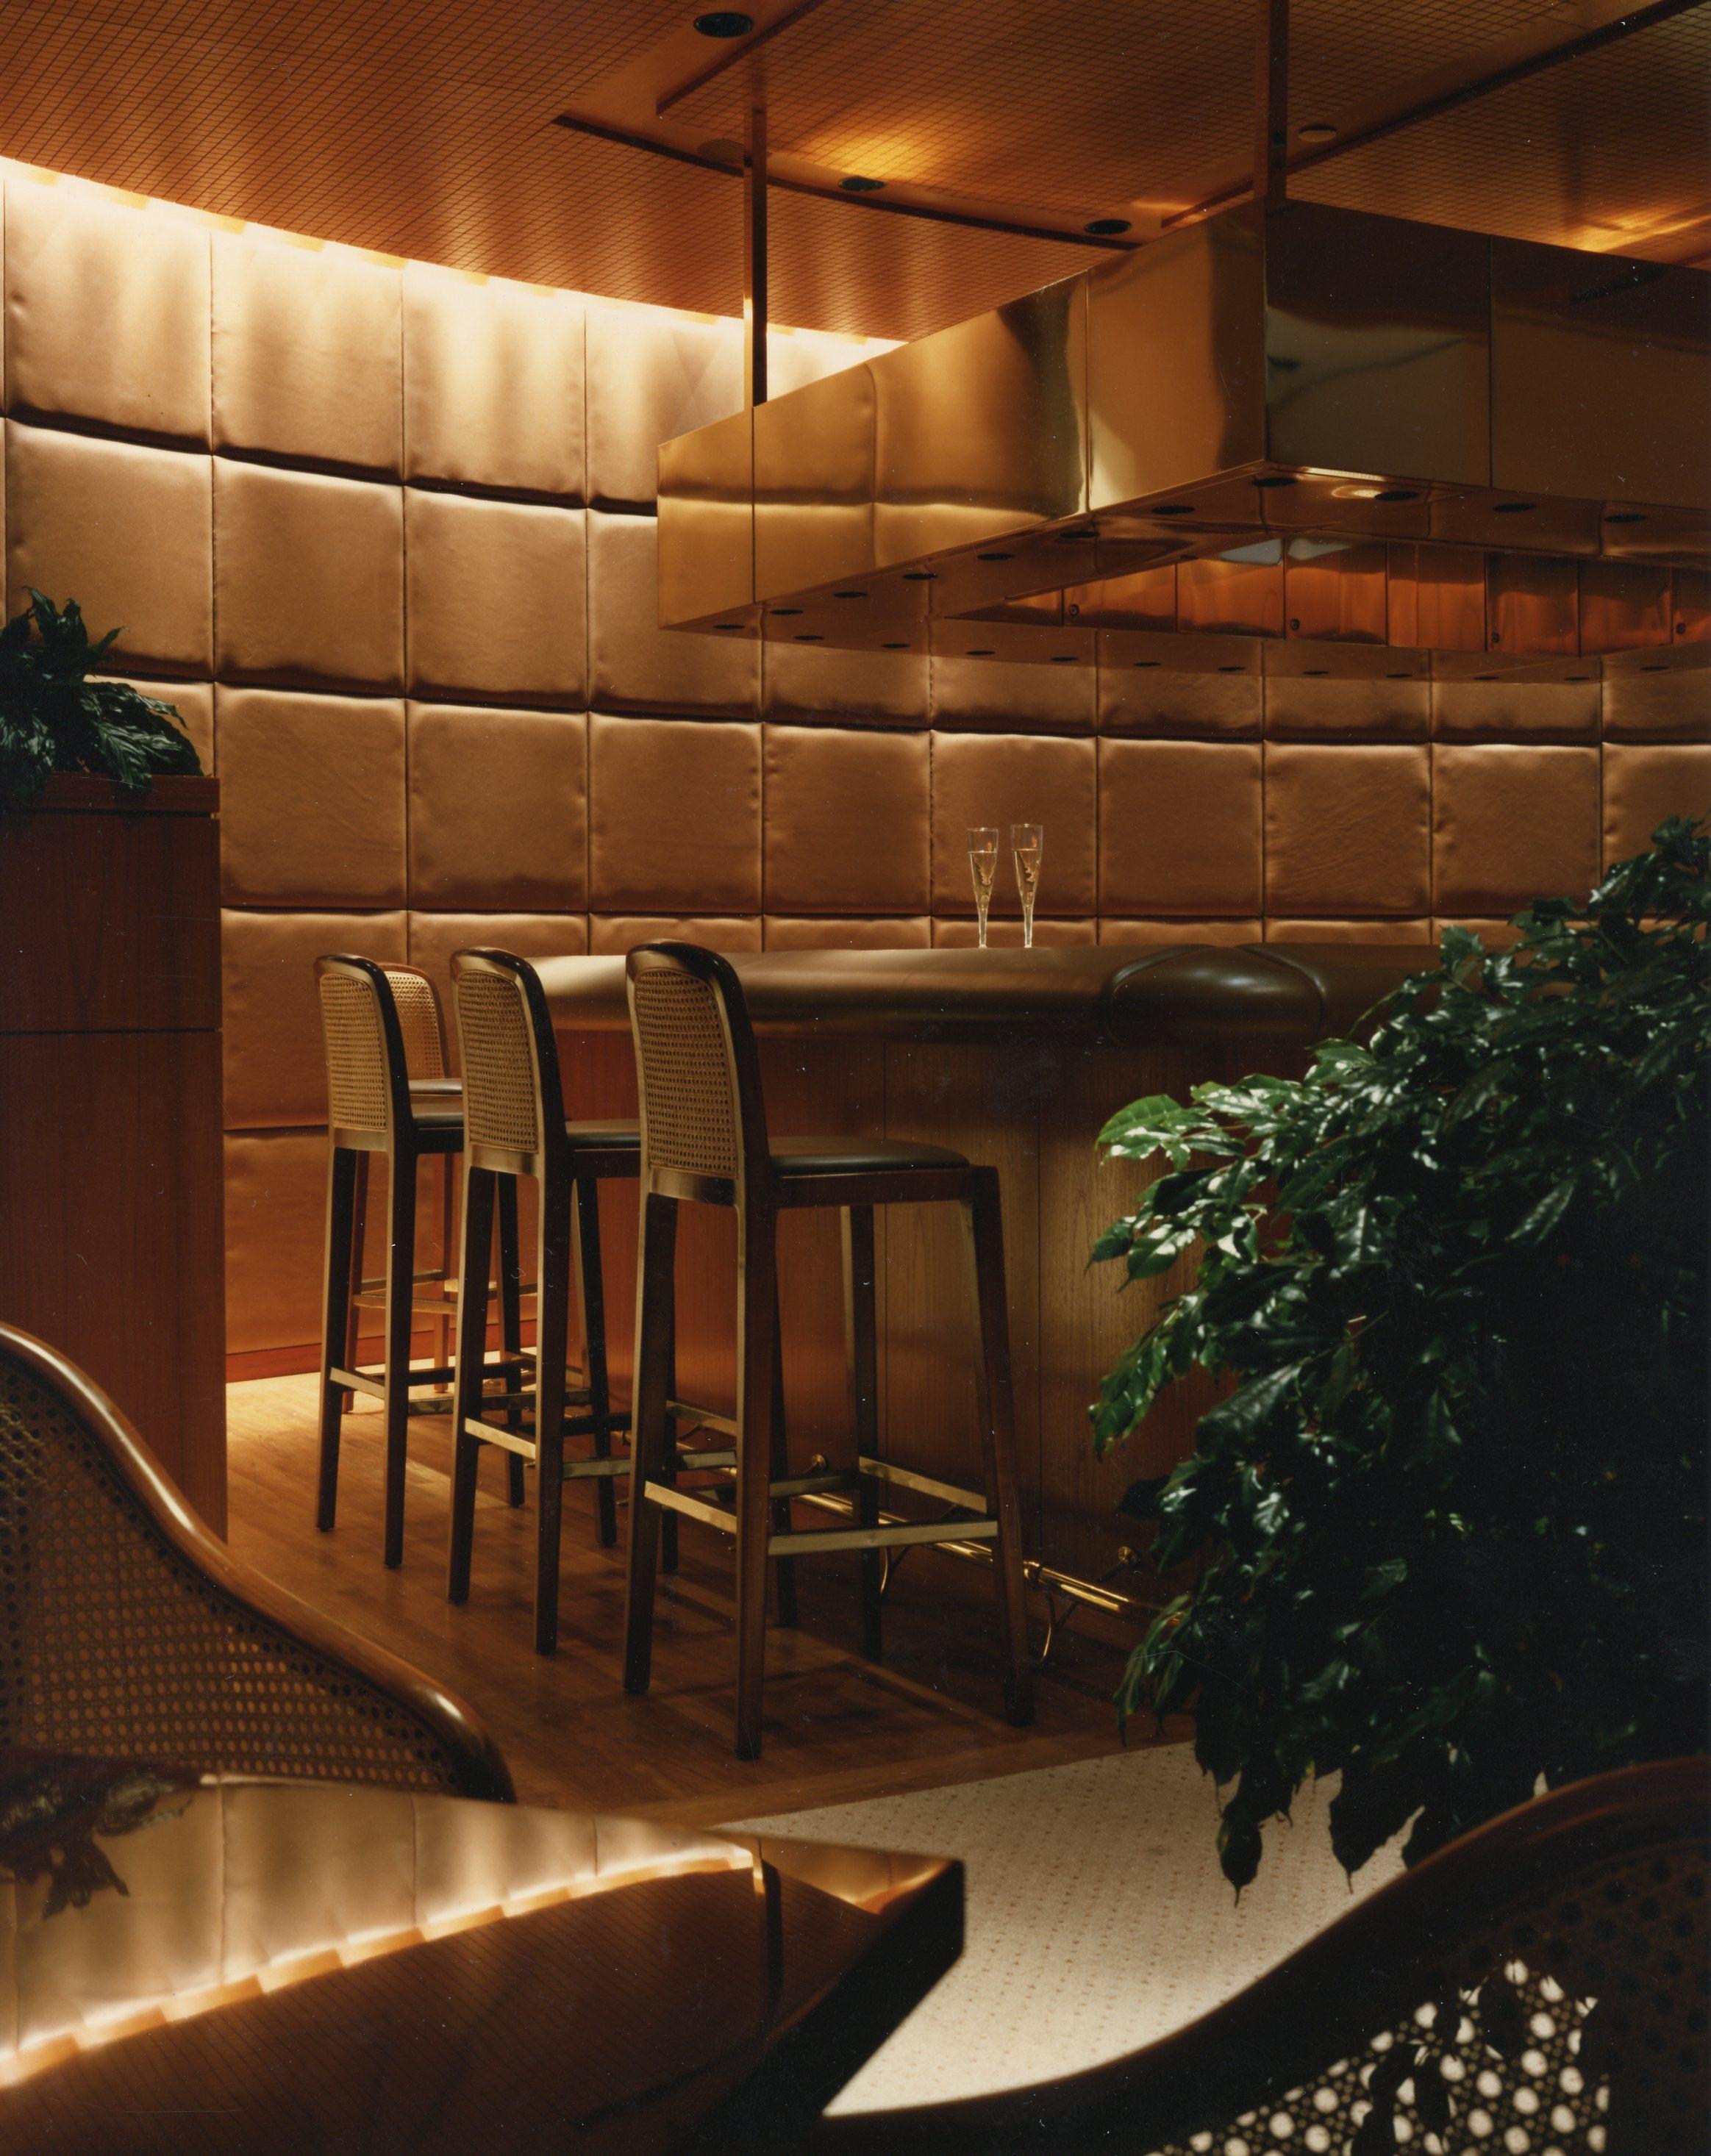 Boca Piano Bar Boca Raton Fla.jpg